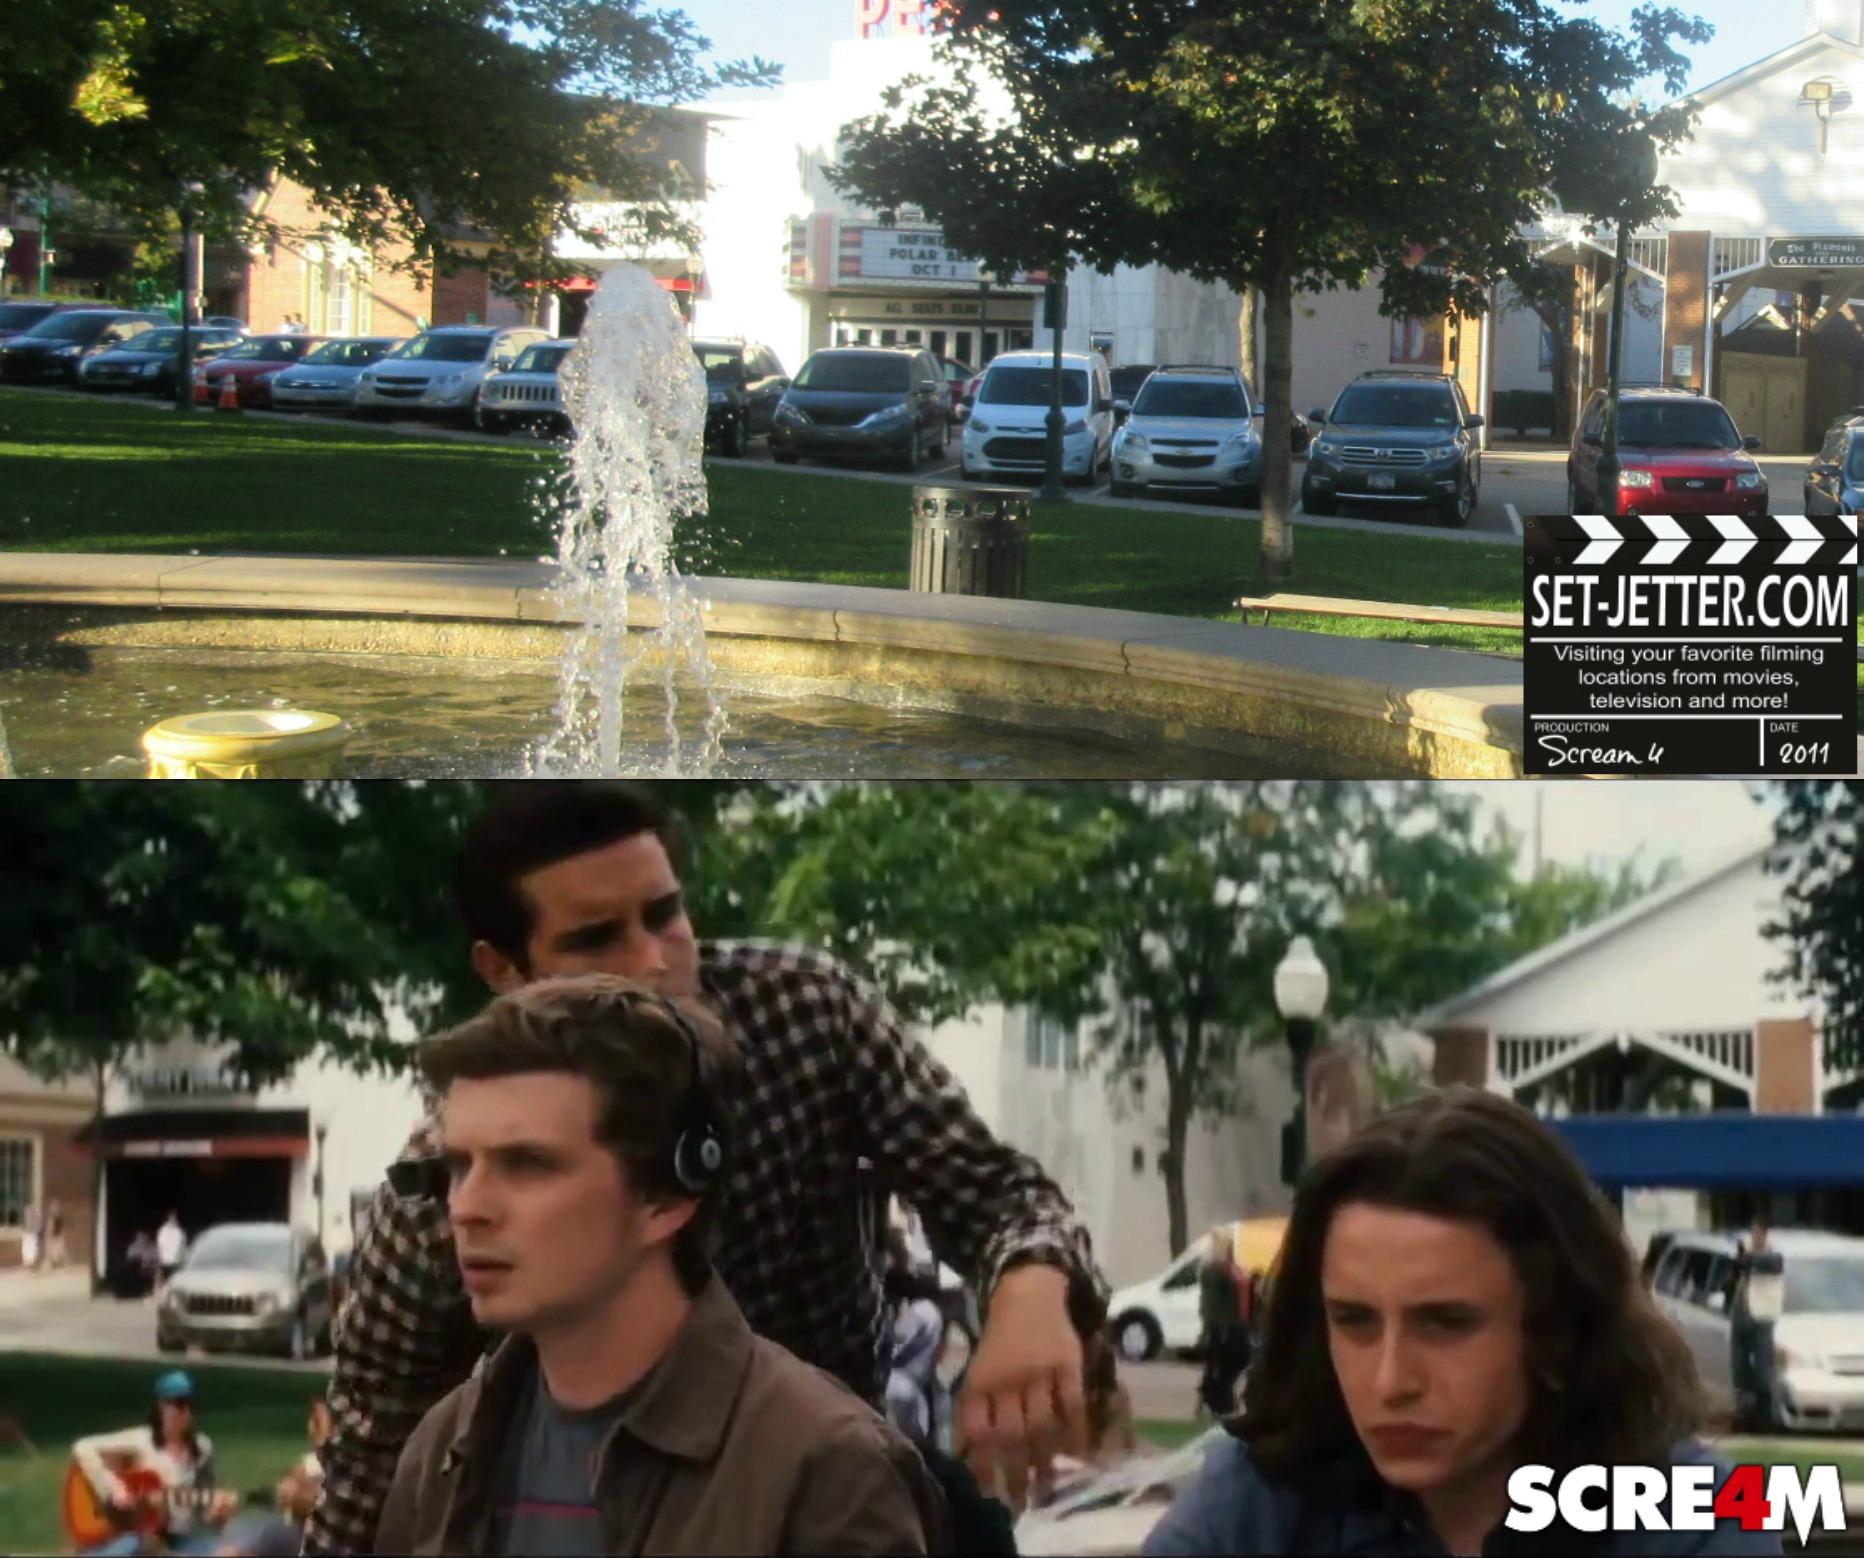 Scream4 comparison 154.jpg